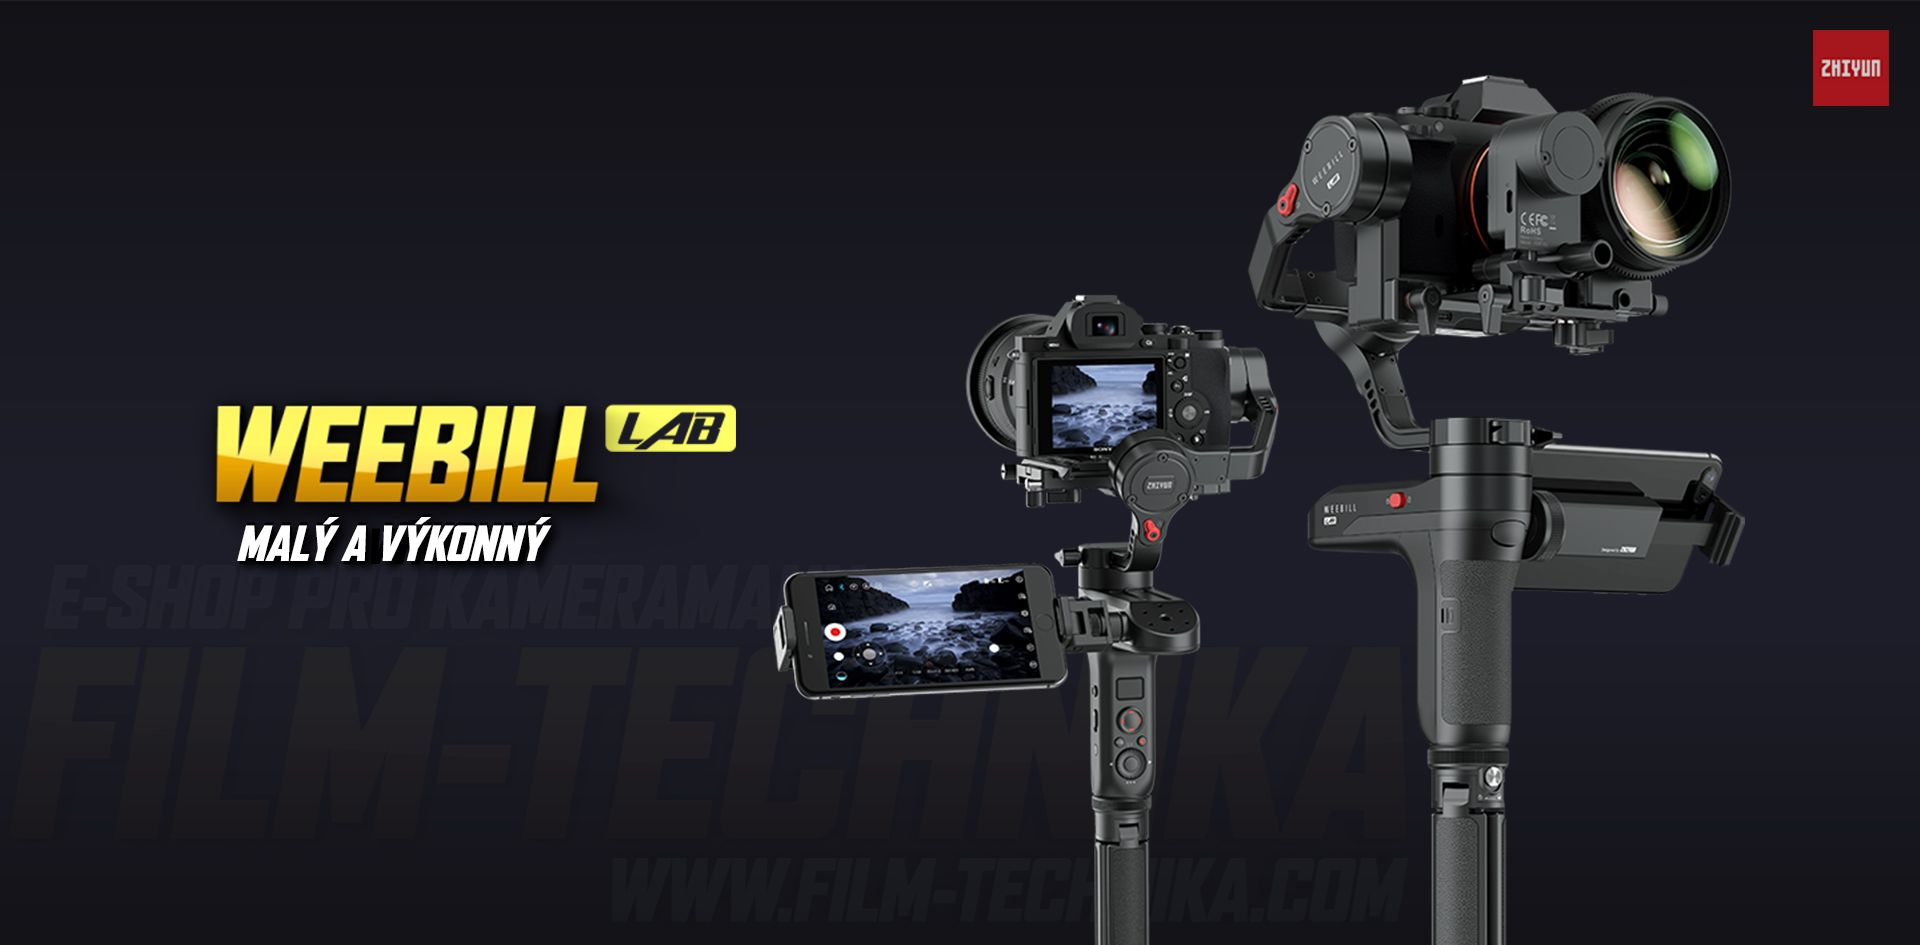 film-technika-zhiyun-weebill-lab-intext1